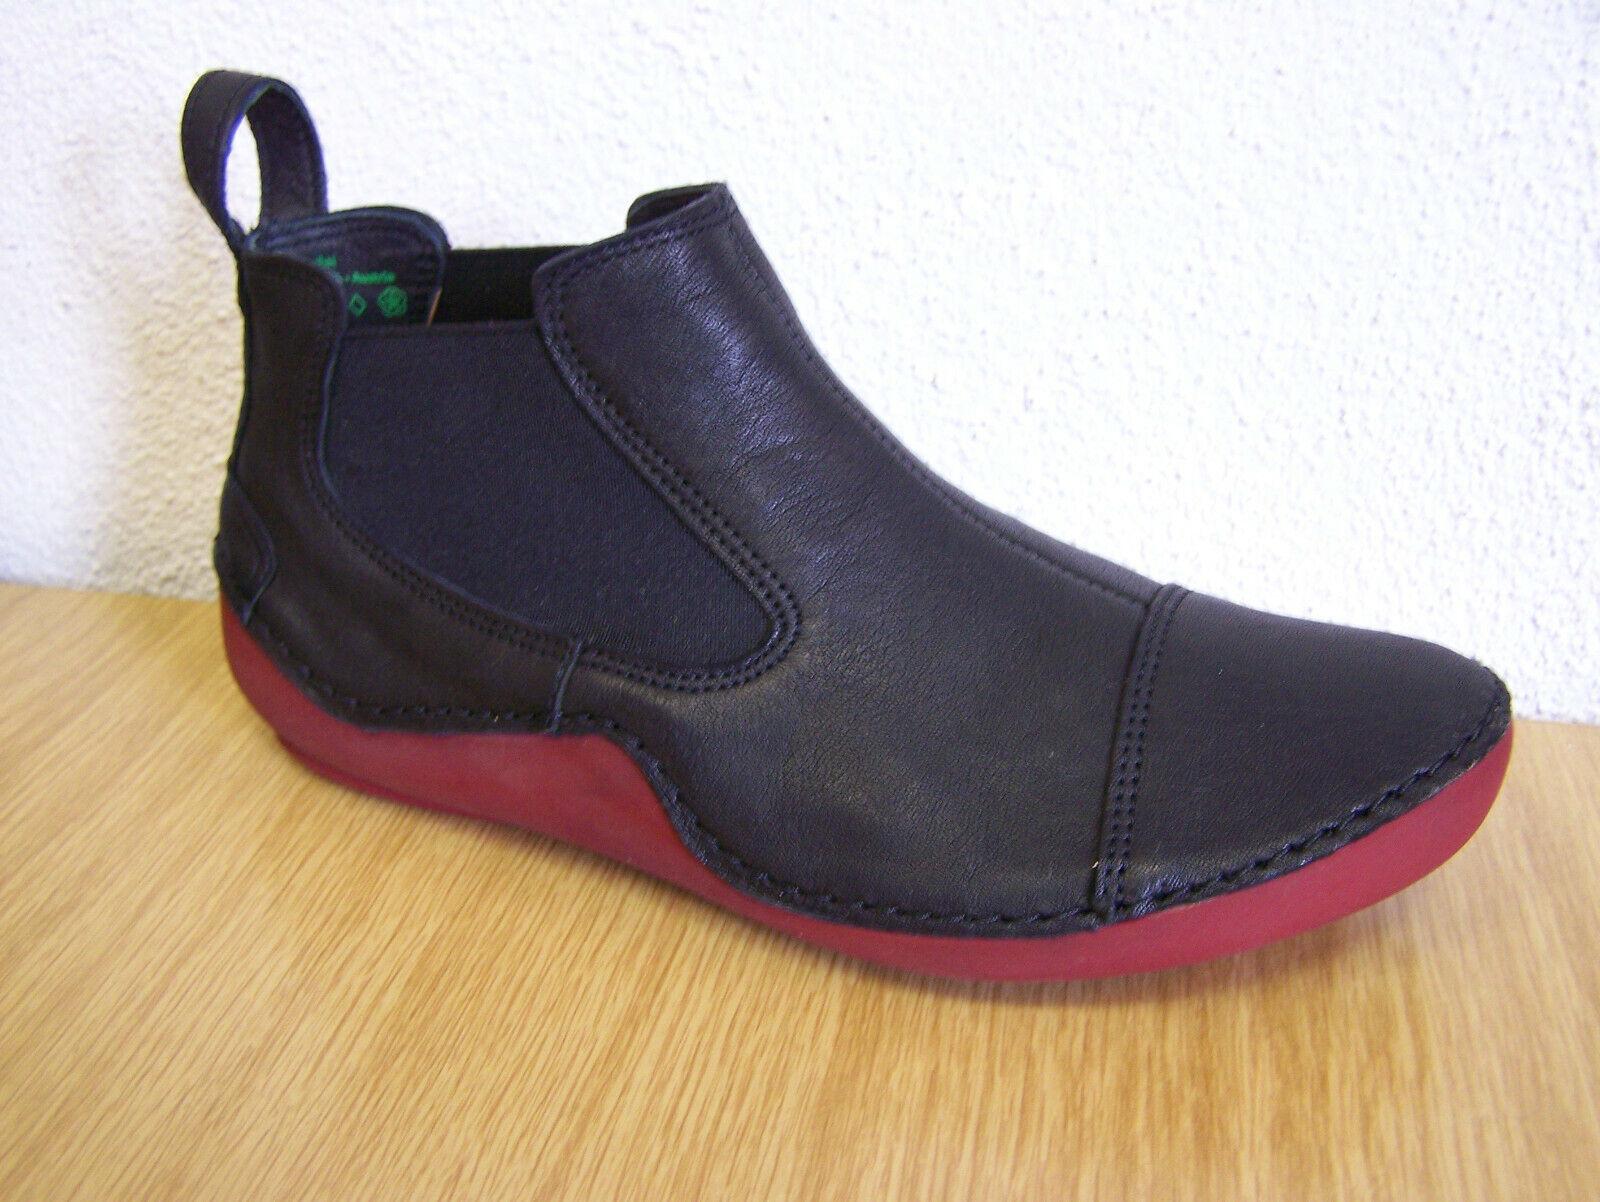 Think  Slipper Modell Kapsl schwarz kombi Gummizug rote Sohle & THINK Papiertüte